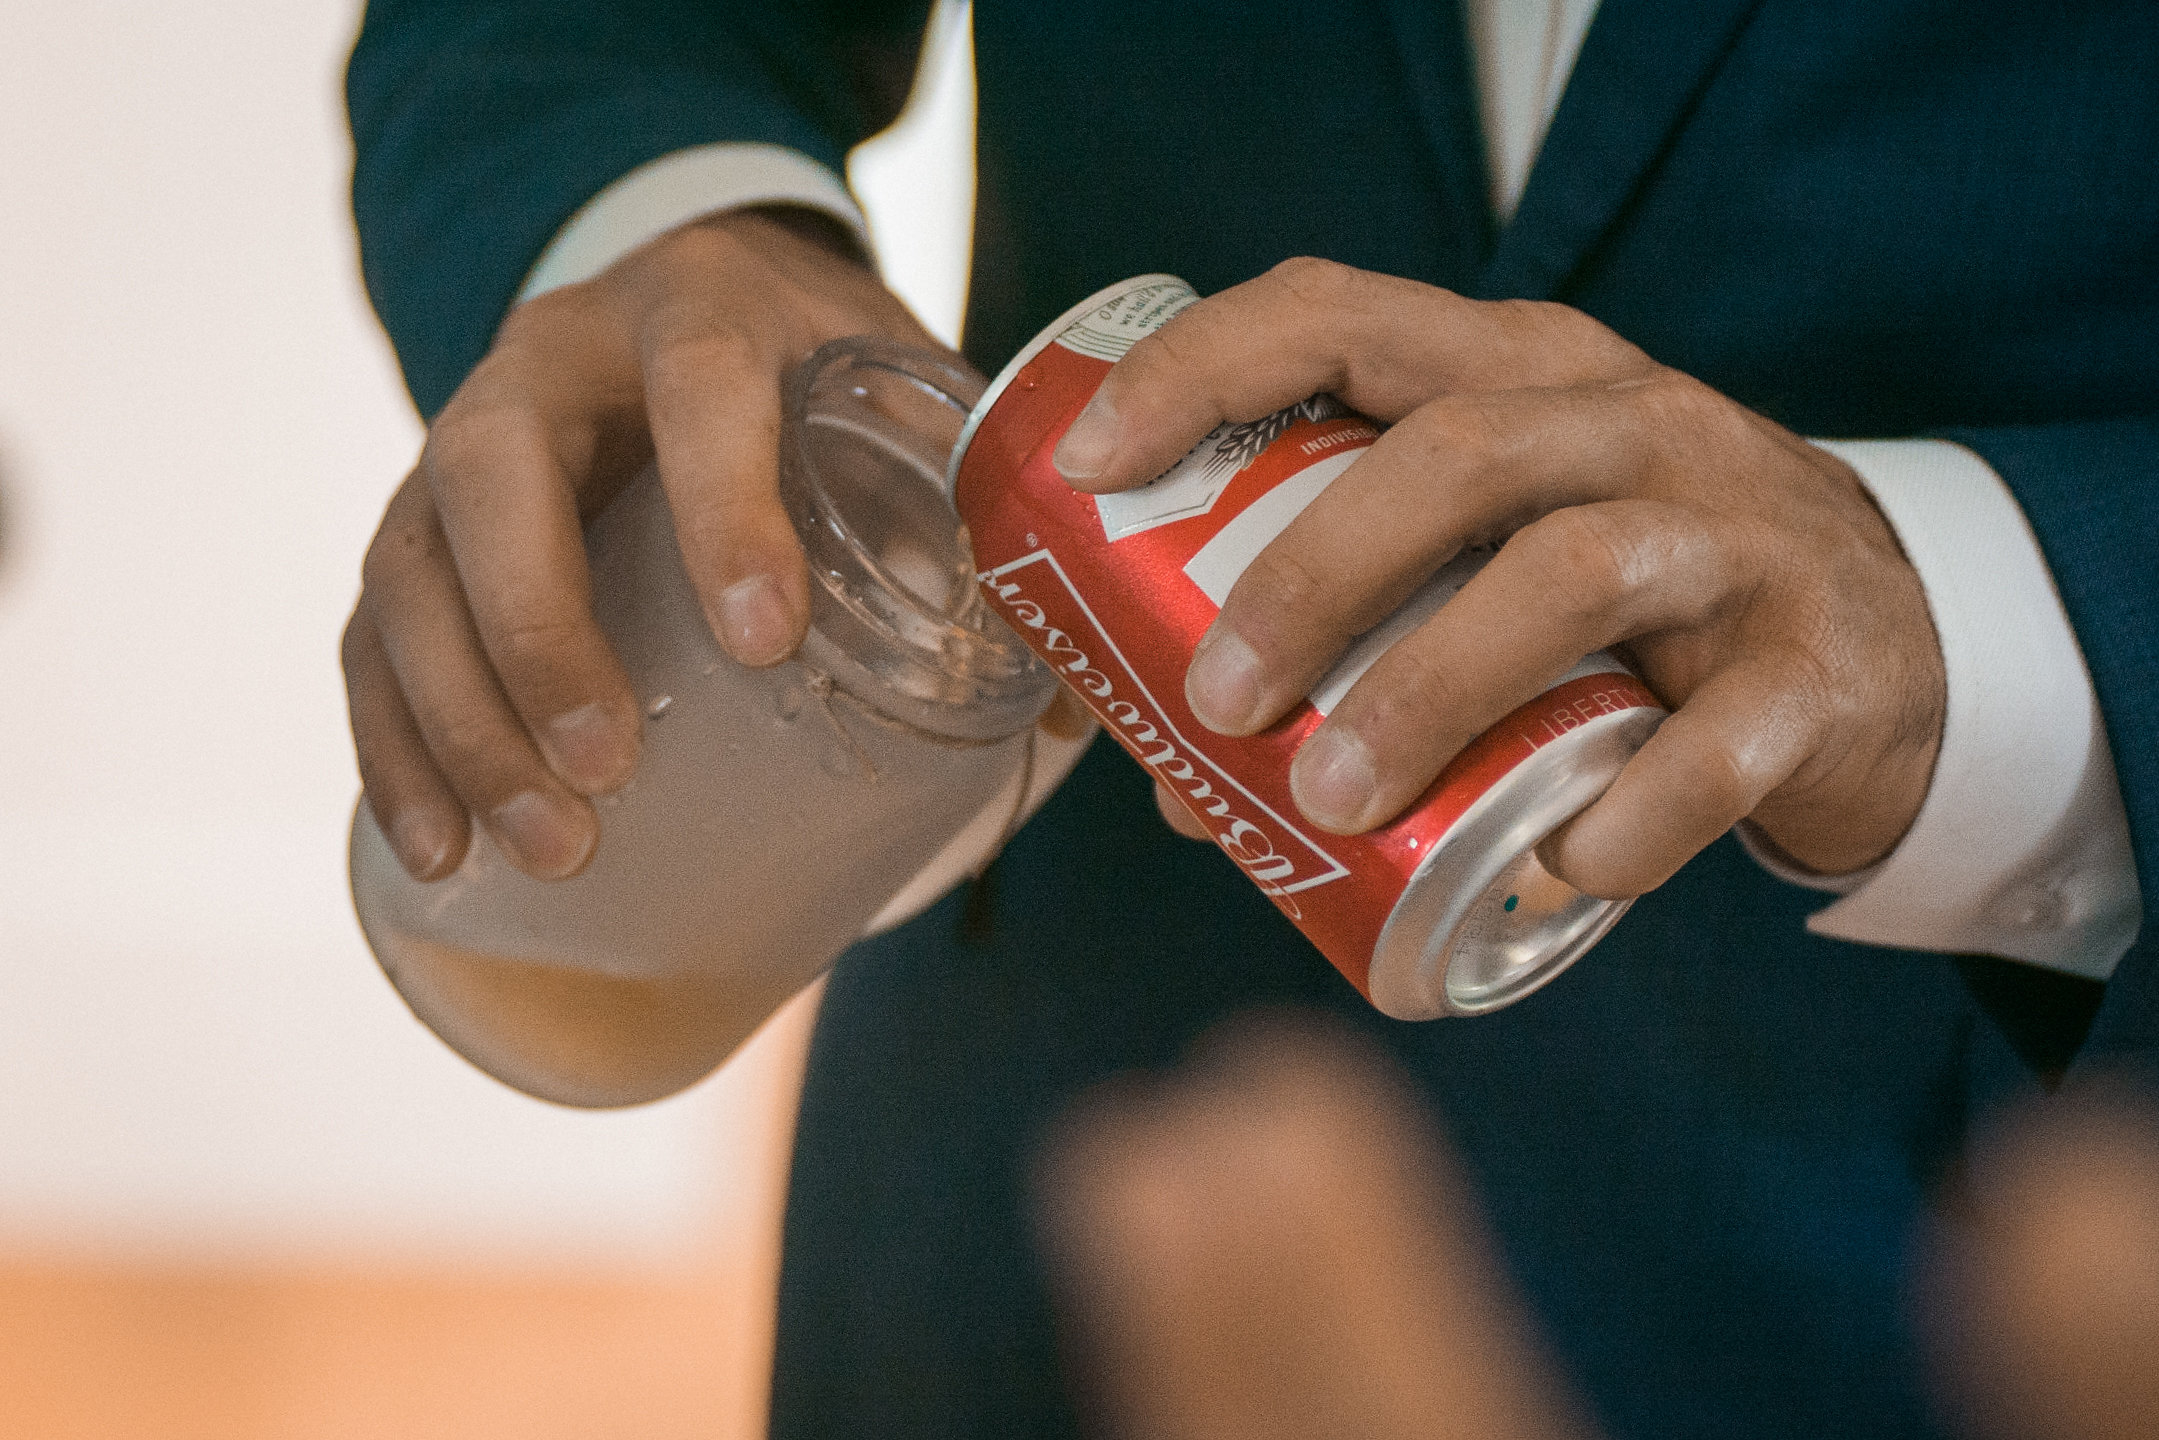 Pouring coke in mason jar